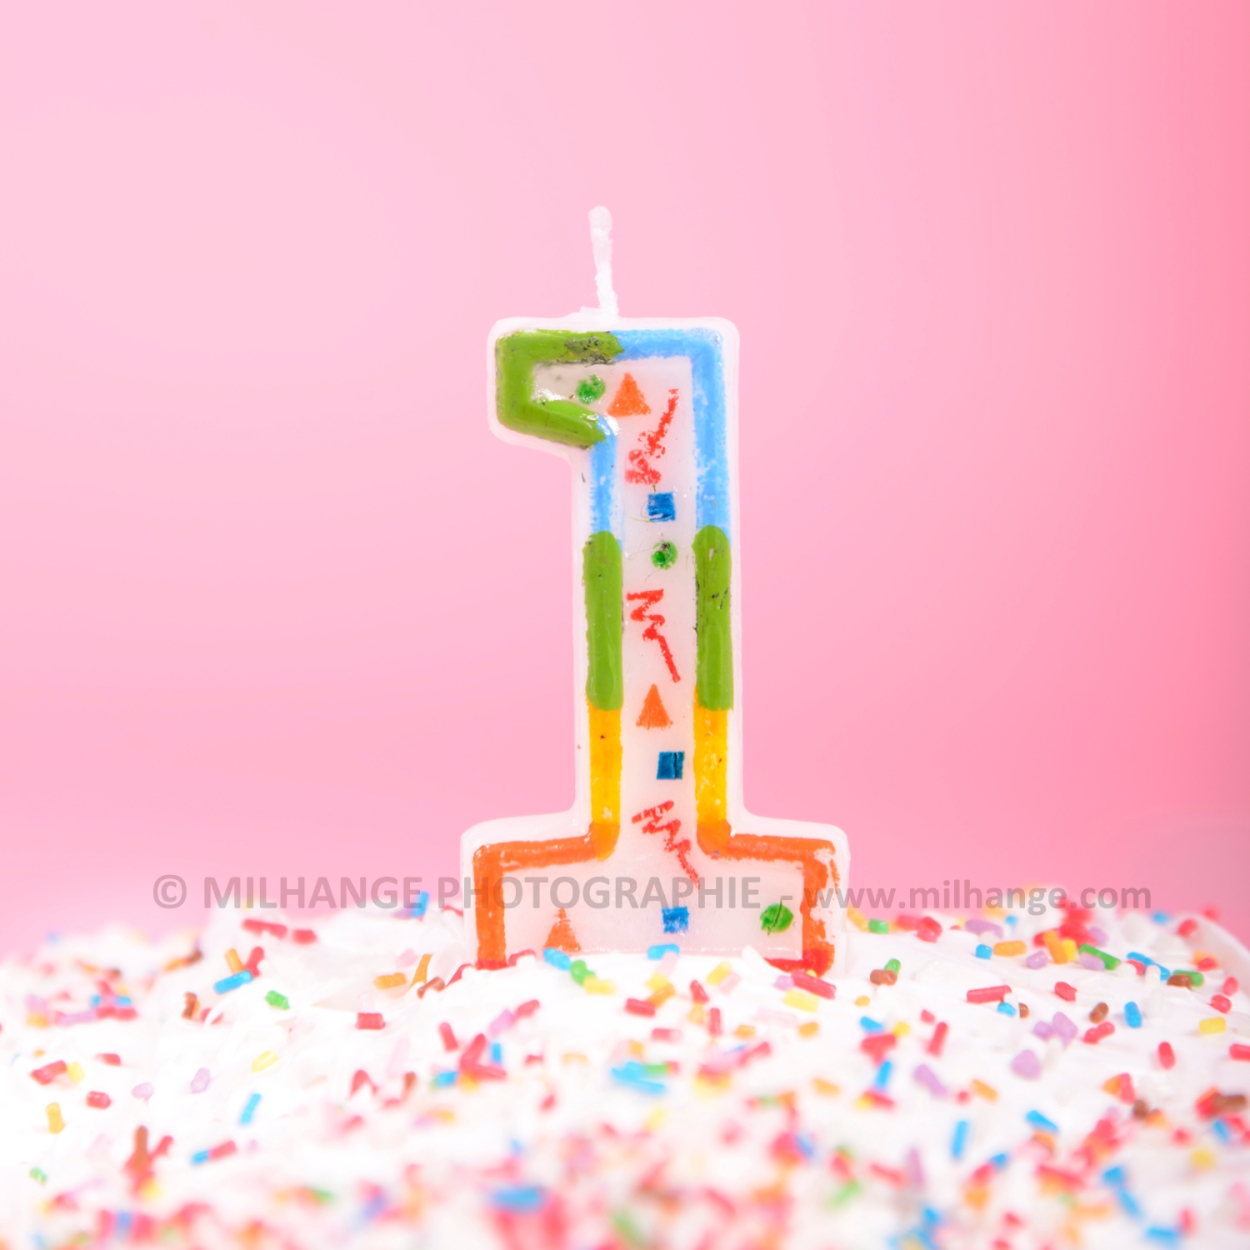 photo-bebe-studio-gateau-anniversaire-fille-libourne-bordeaux-charente-maritime-3